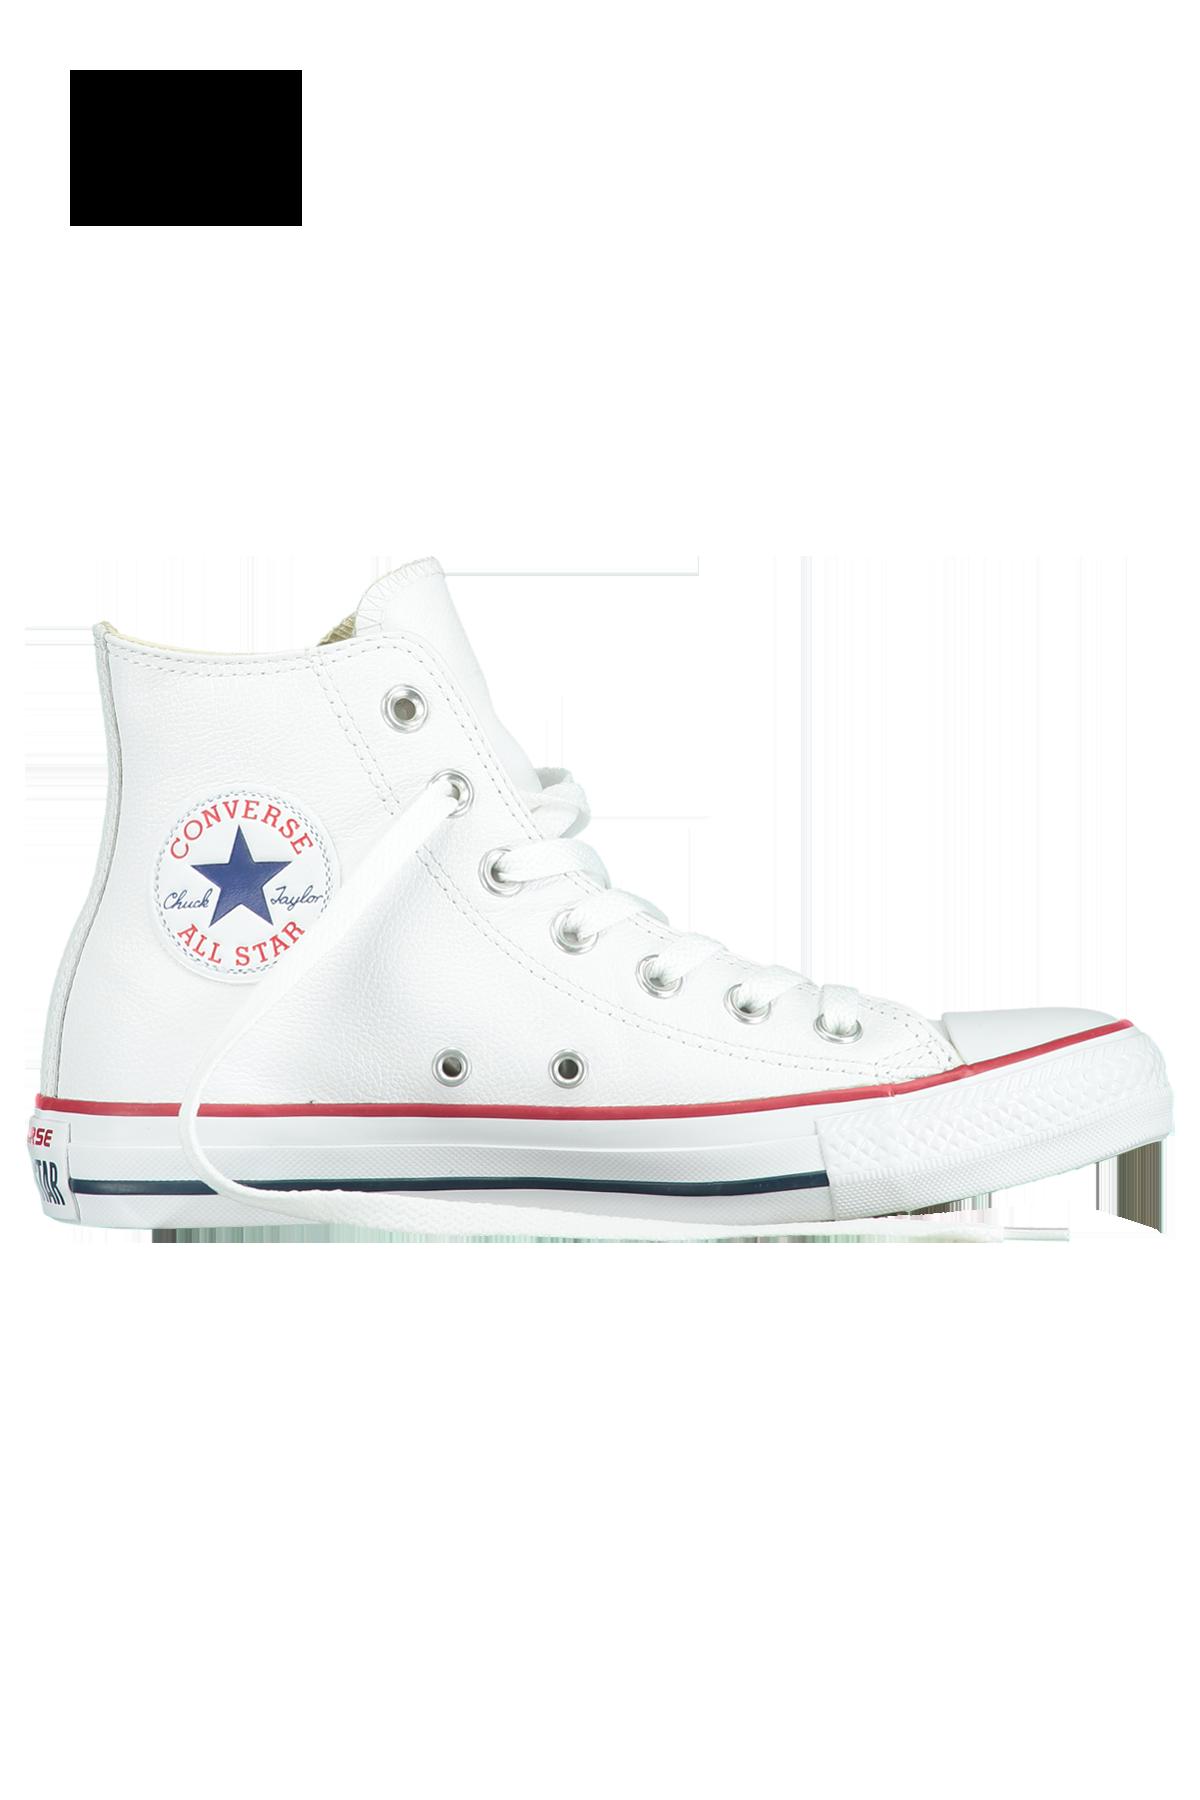 Converse All Stars Chuck Taylor HI